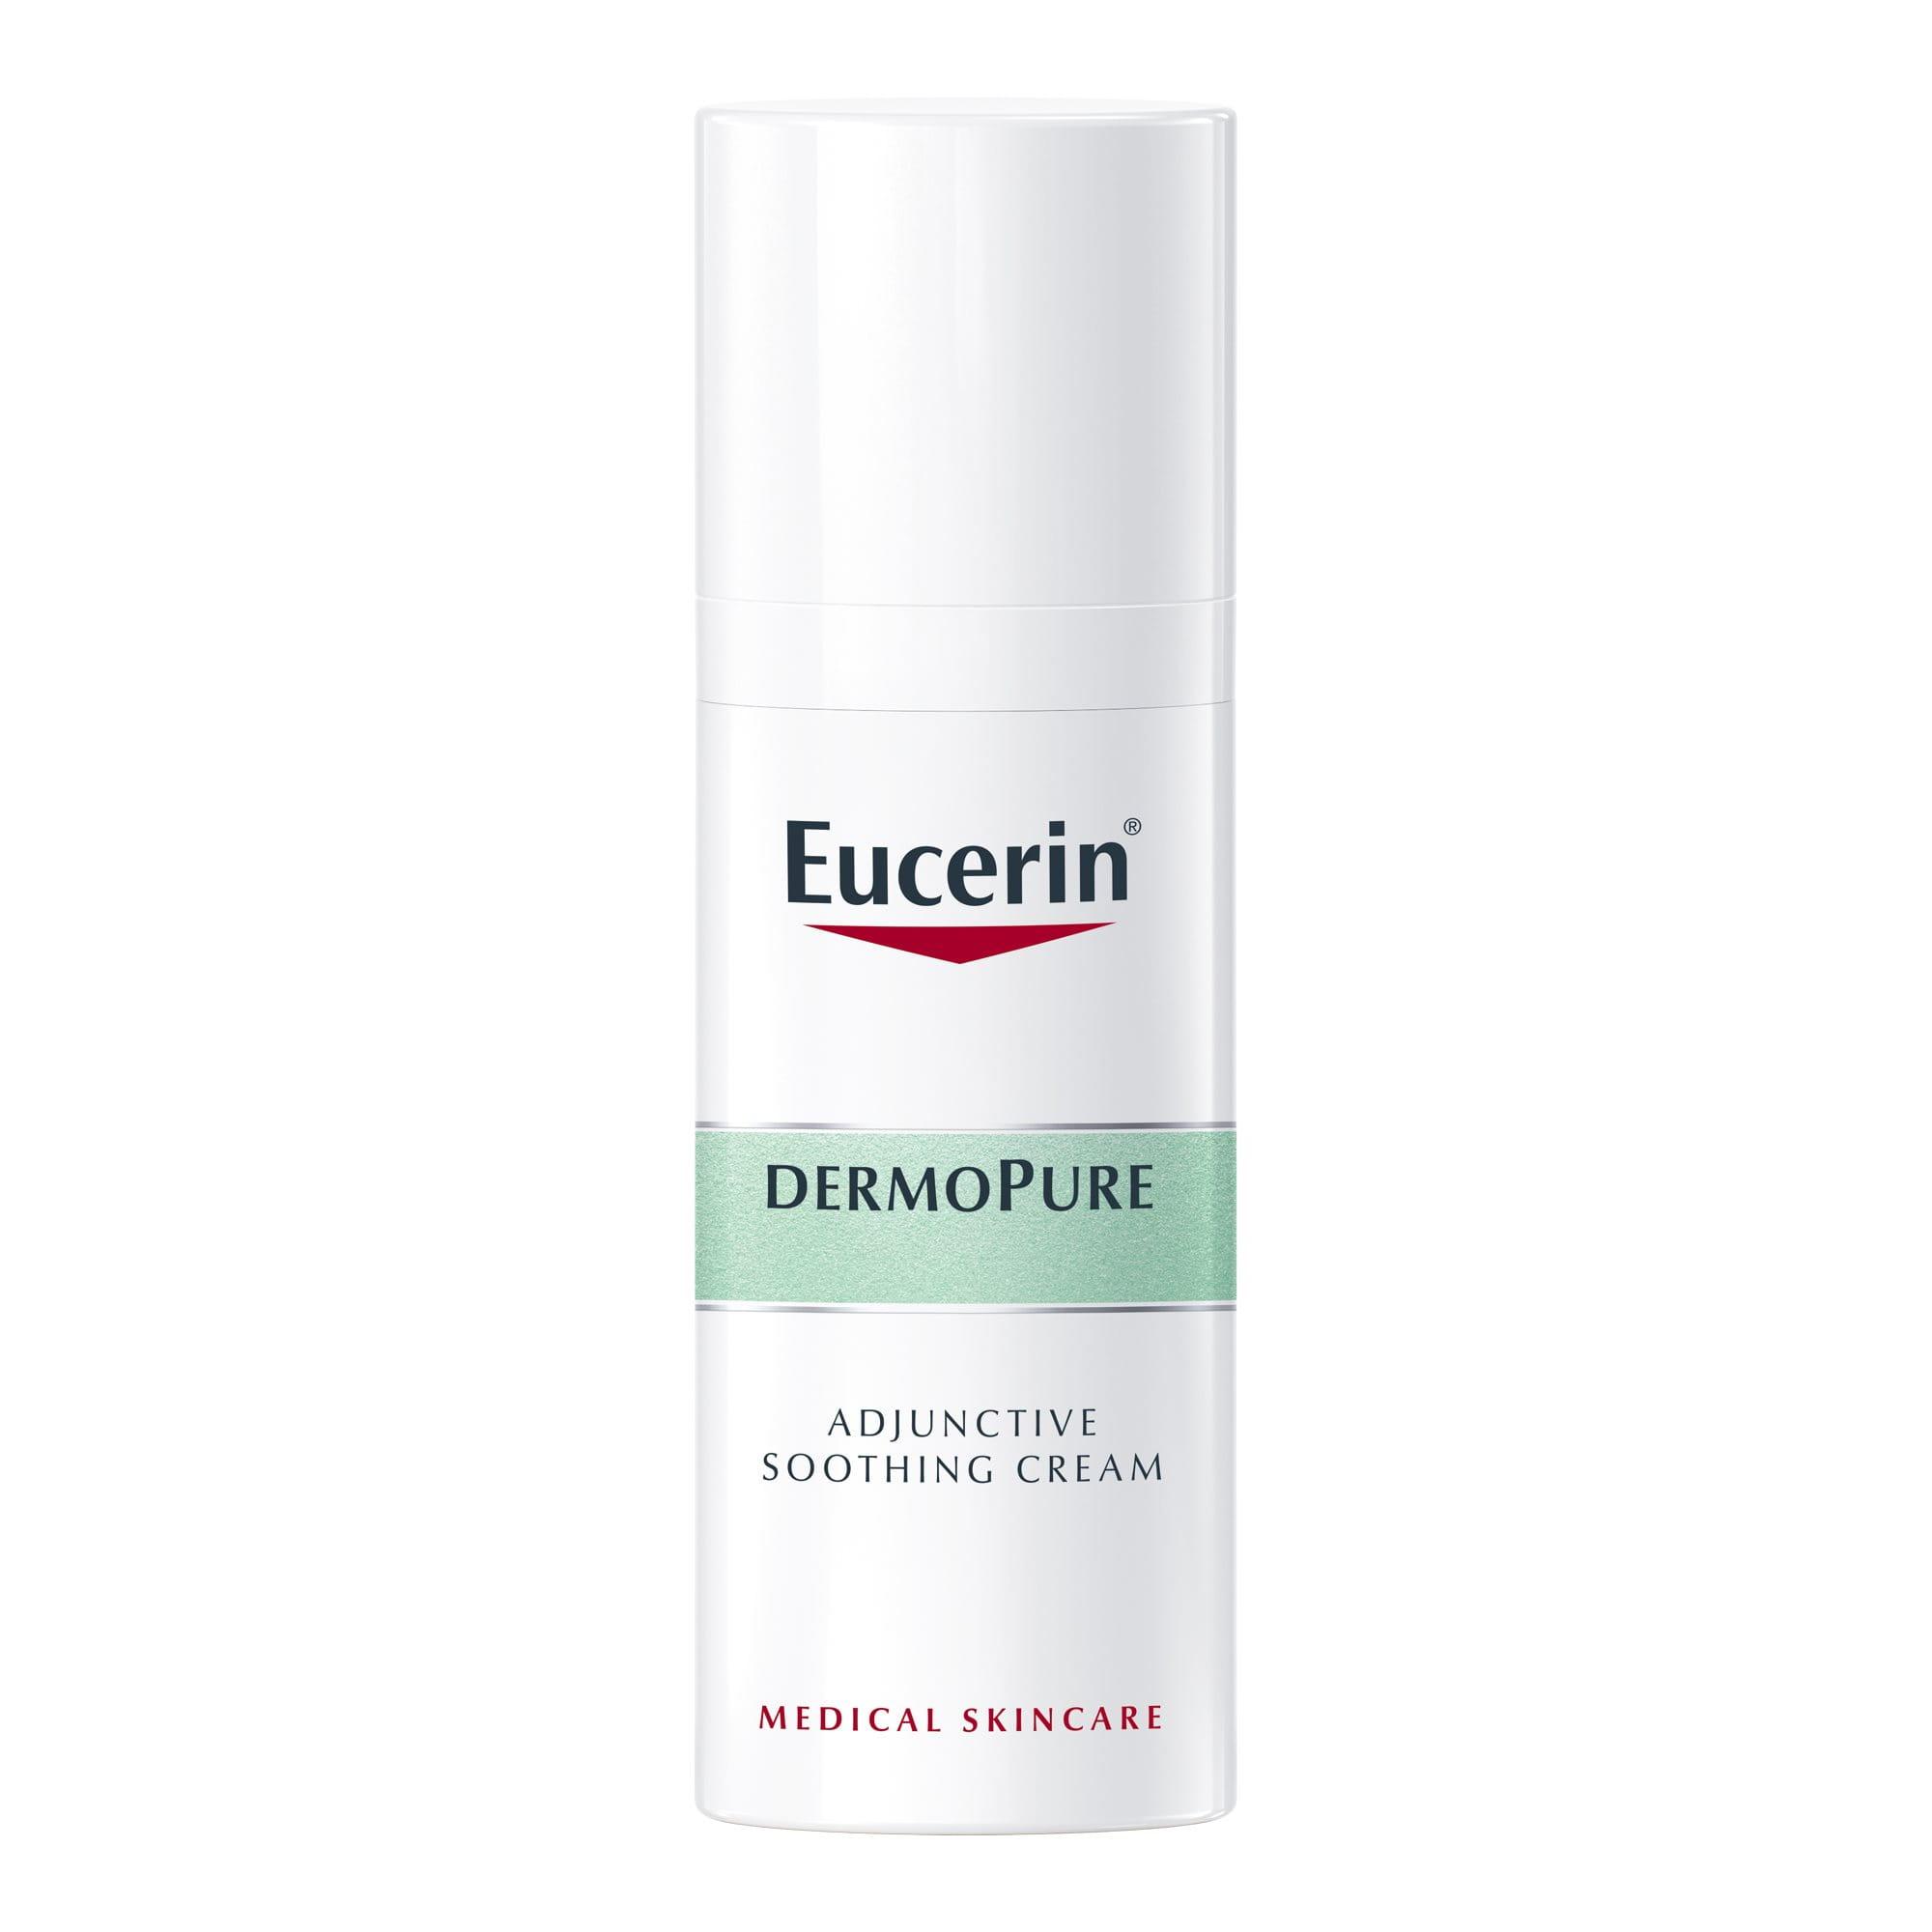 88969-Eucerin-DermoPure-Balsamo-Calmante_packshot